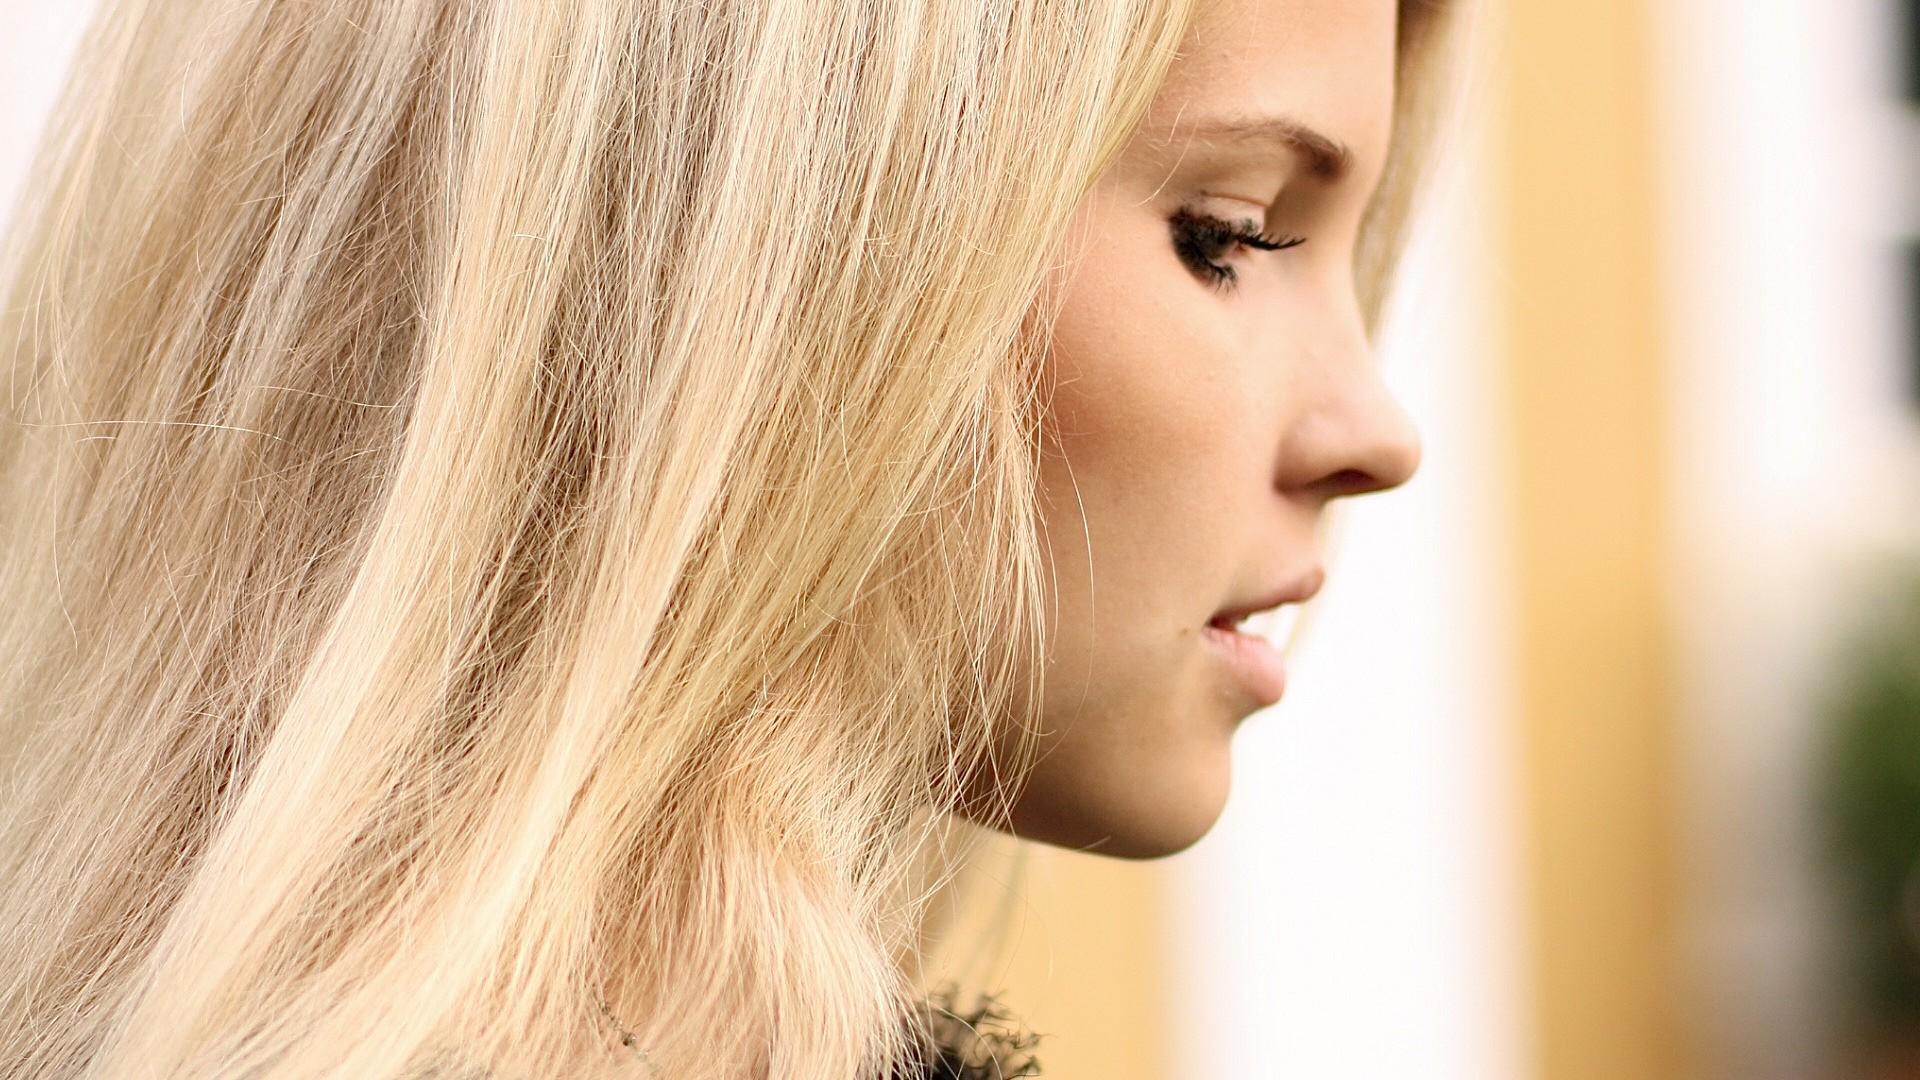 hintergrundbilder gesicht frau modell blond lange haare profil haar nase emilie marie. Black Bedroom Furniture Sets. Home Design Ideas